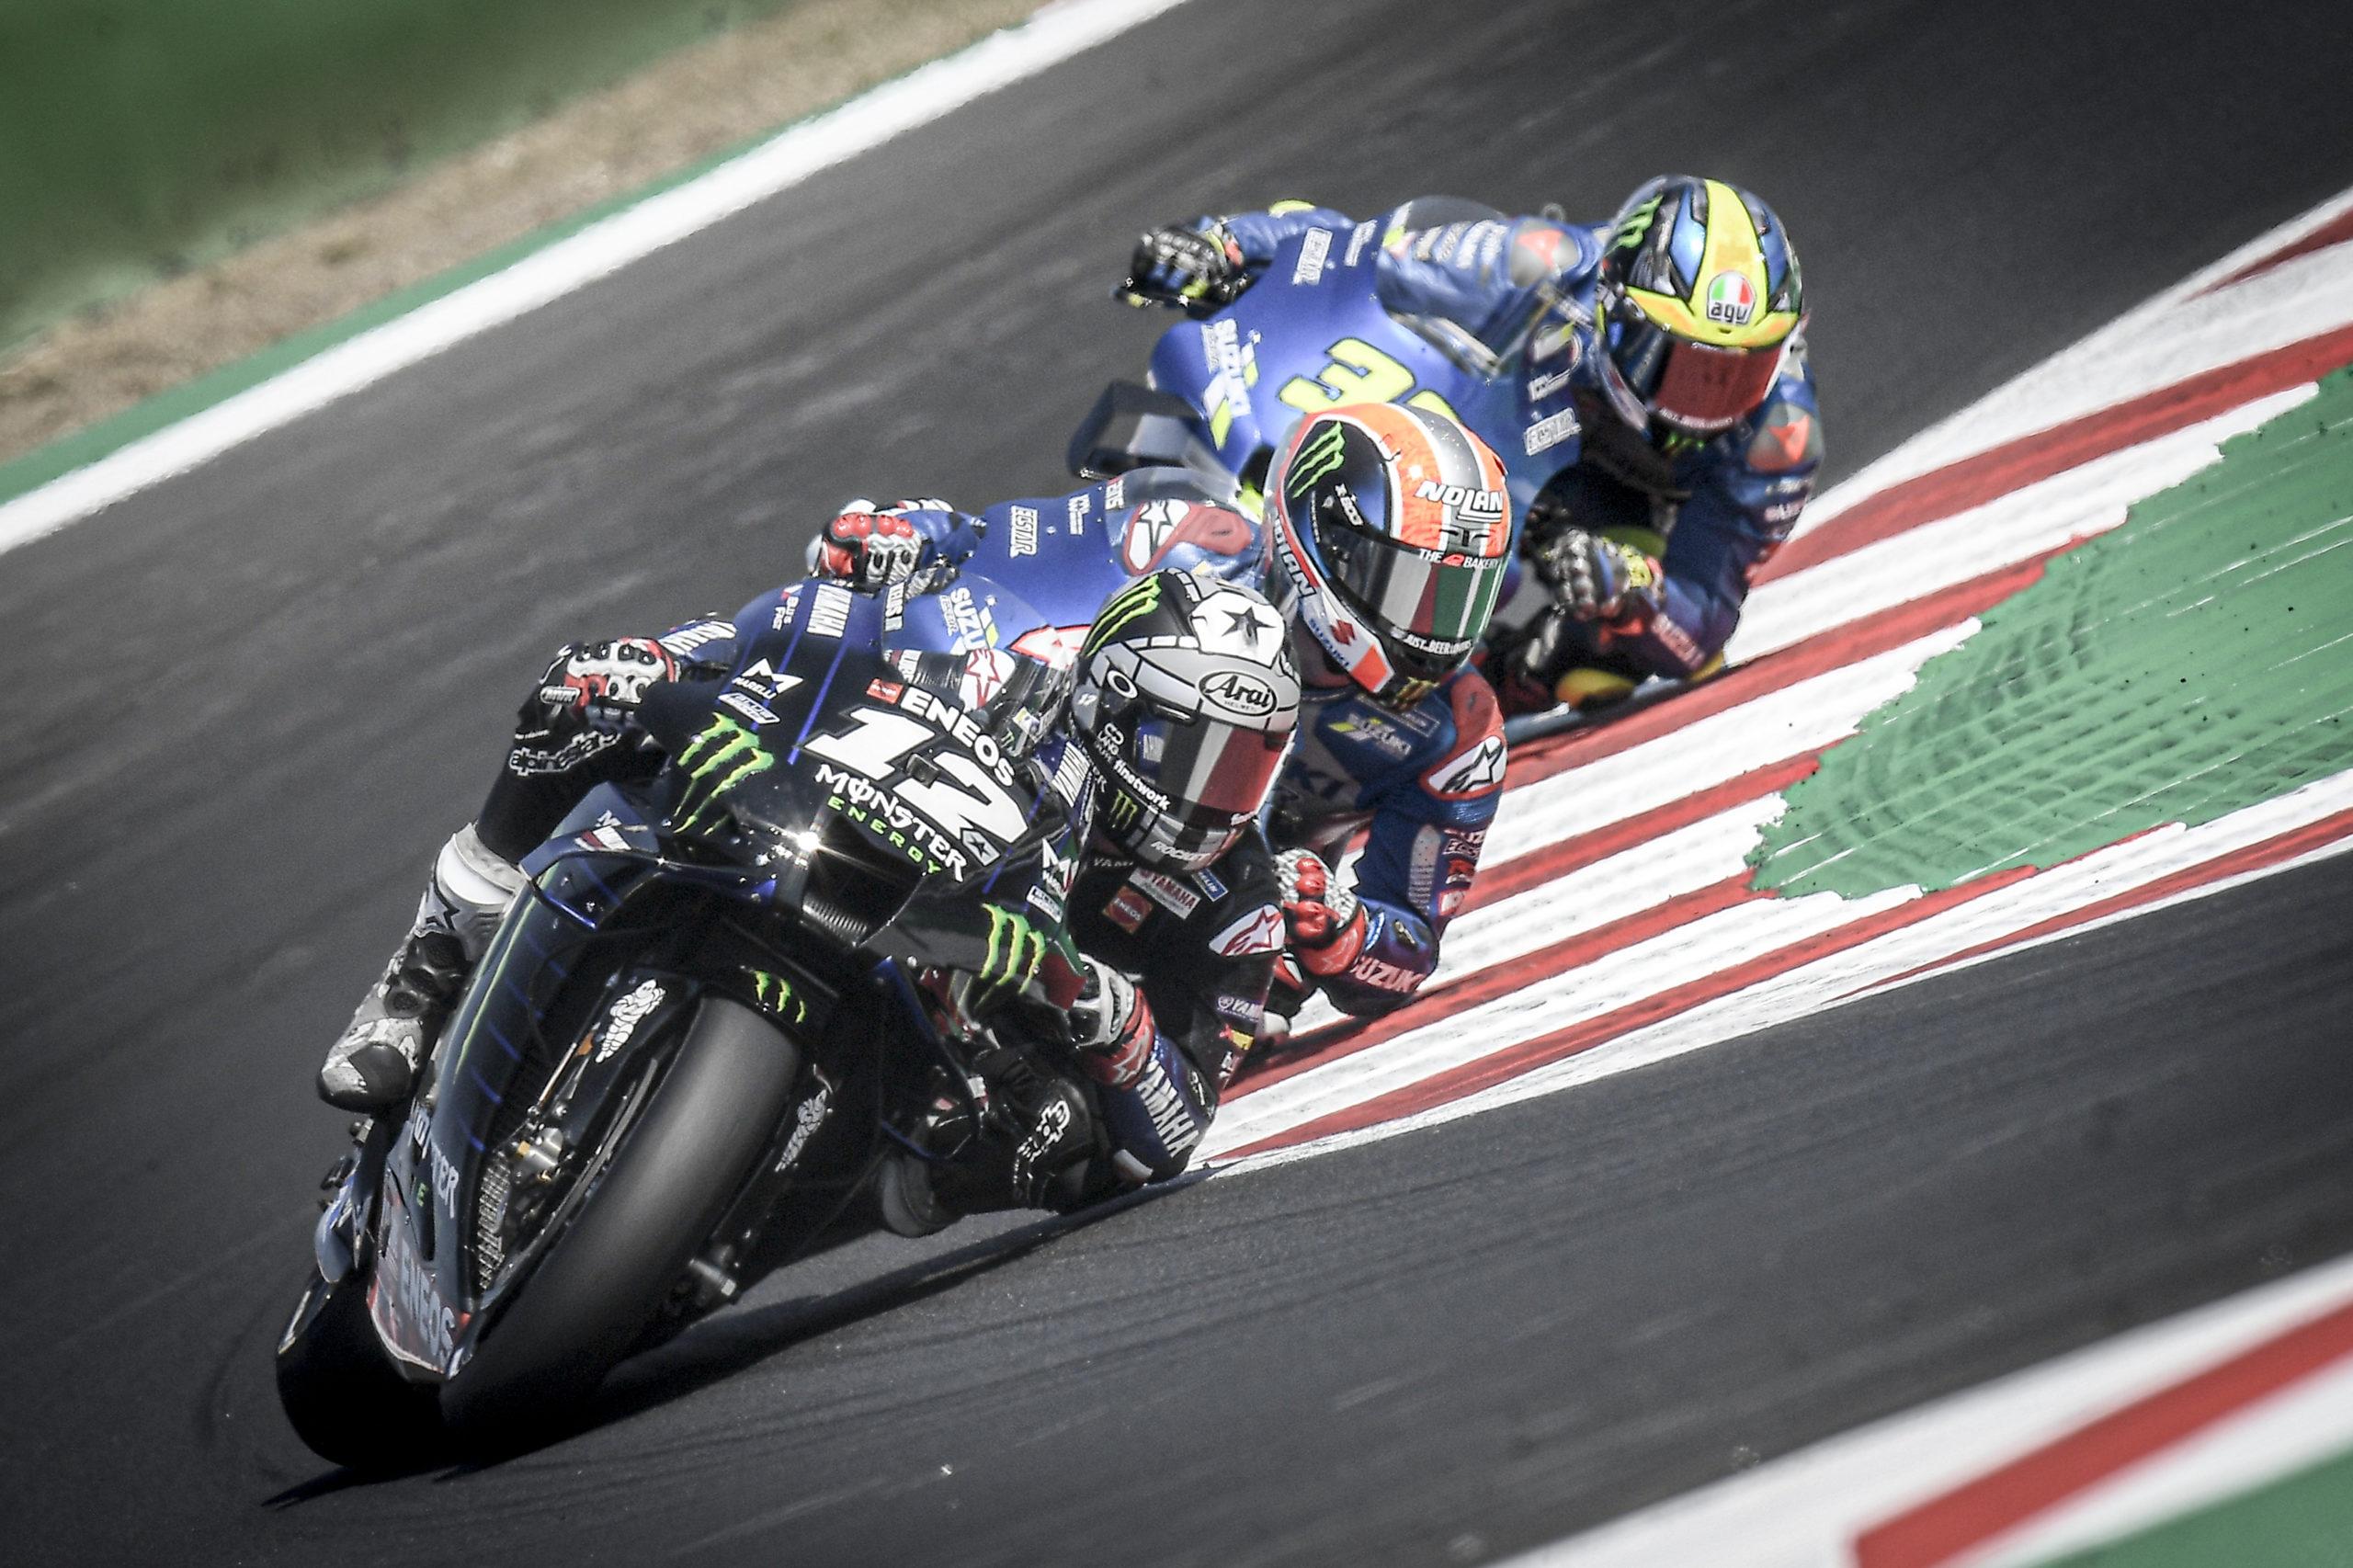 Maverick Viñales, Alex Rins, Joan Mir, San Marino MotoGP. 13September 2020